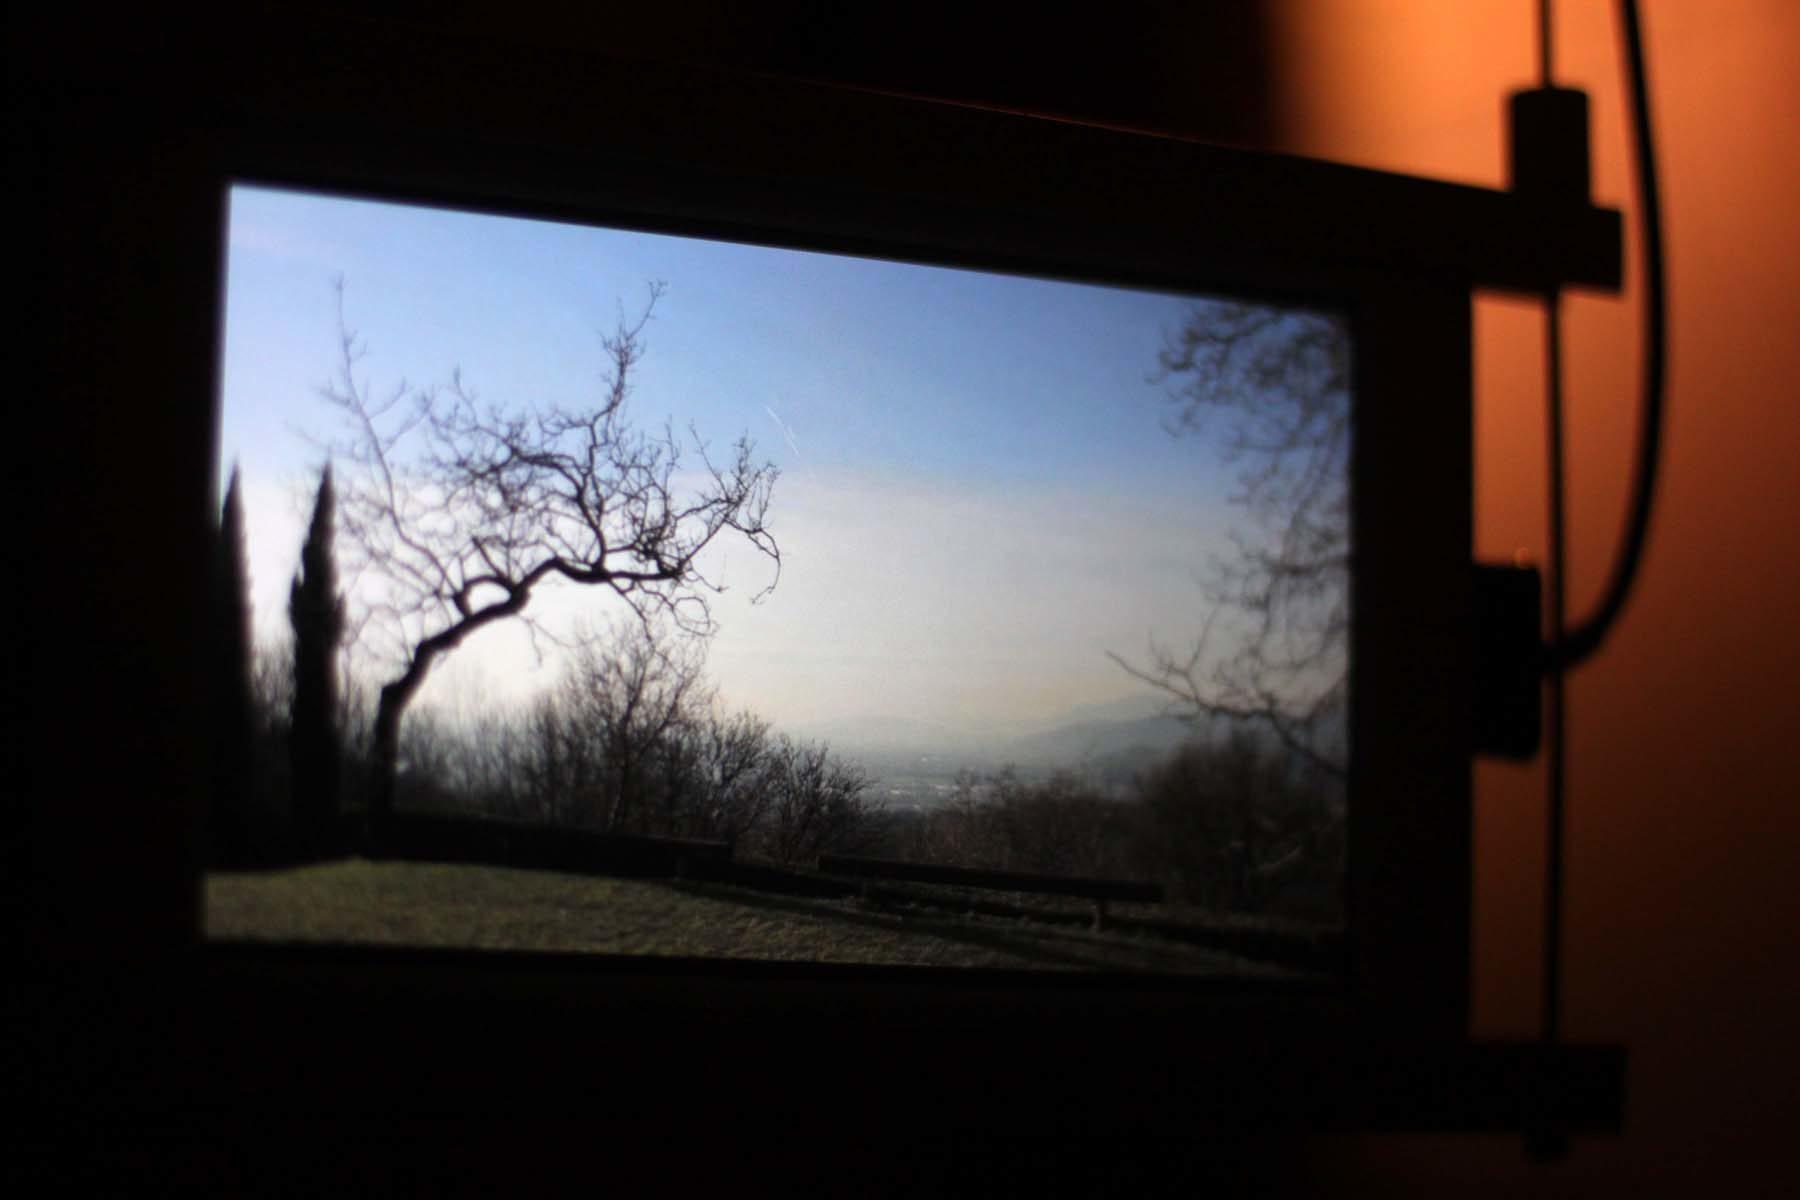 C. Luiselli, Rediscovered Horizons, 2015, istallation, Oratorio San Lupo, Bergamo, ph. V.Mussi